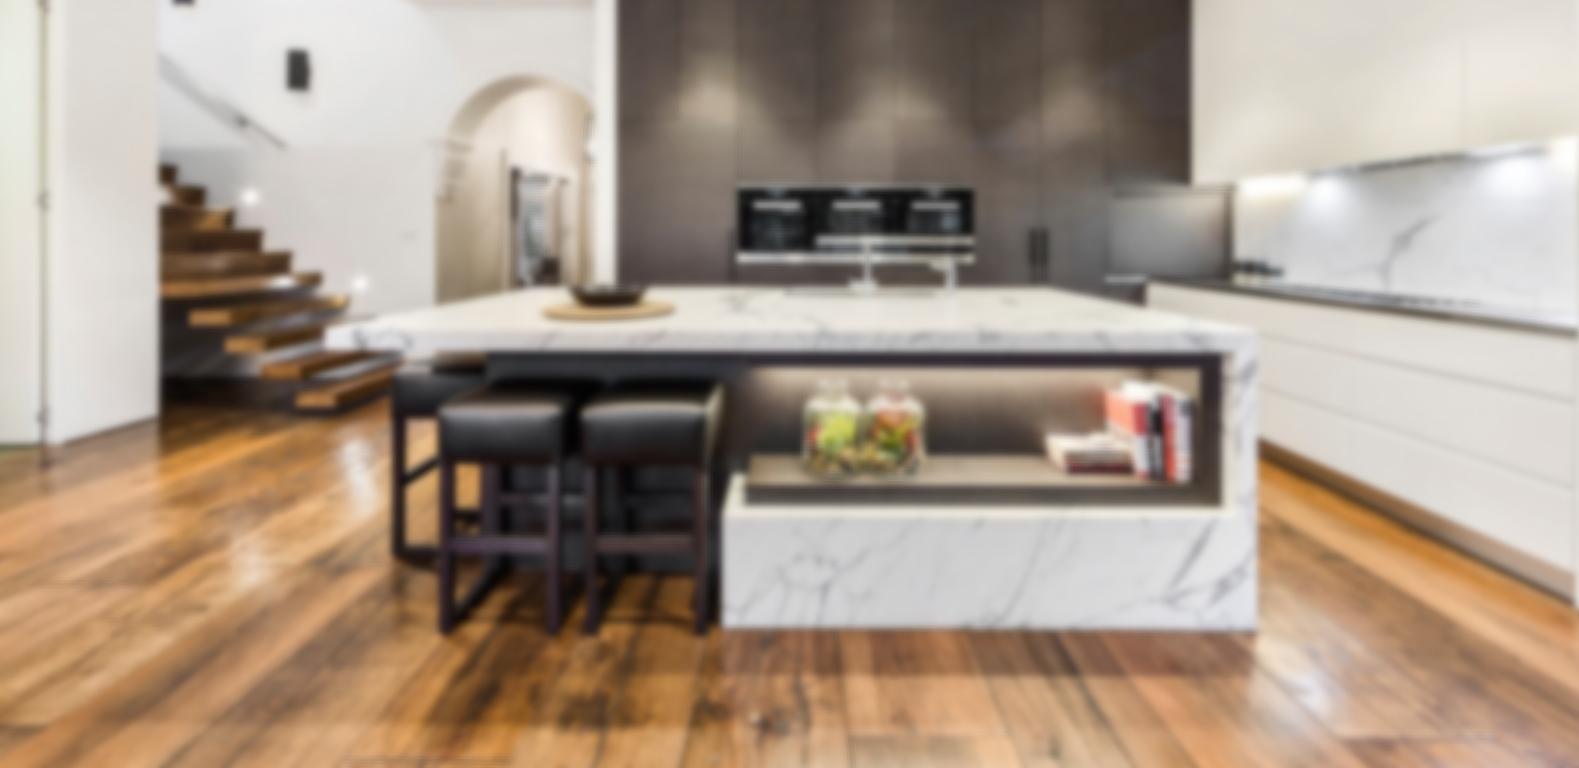 11 Kitchen Design Tips And Tricks